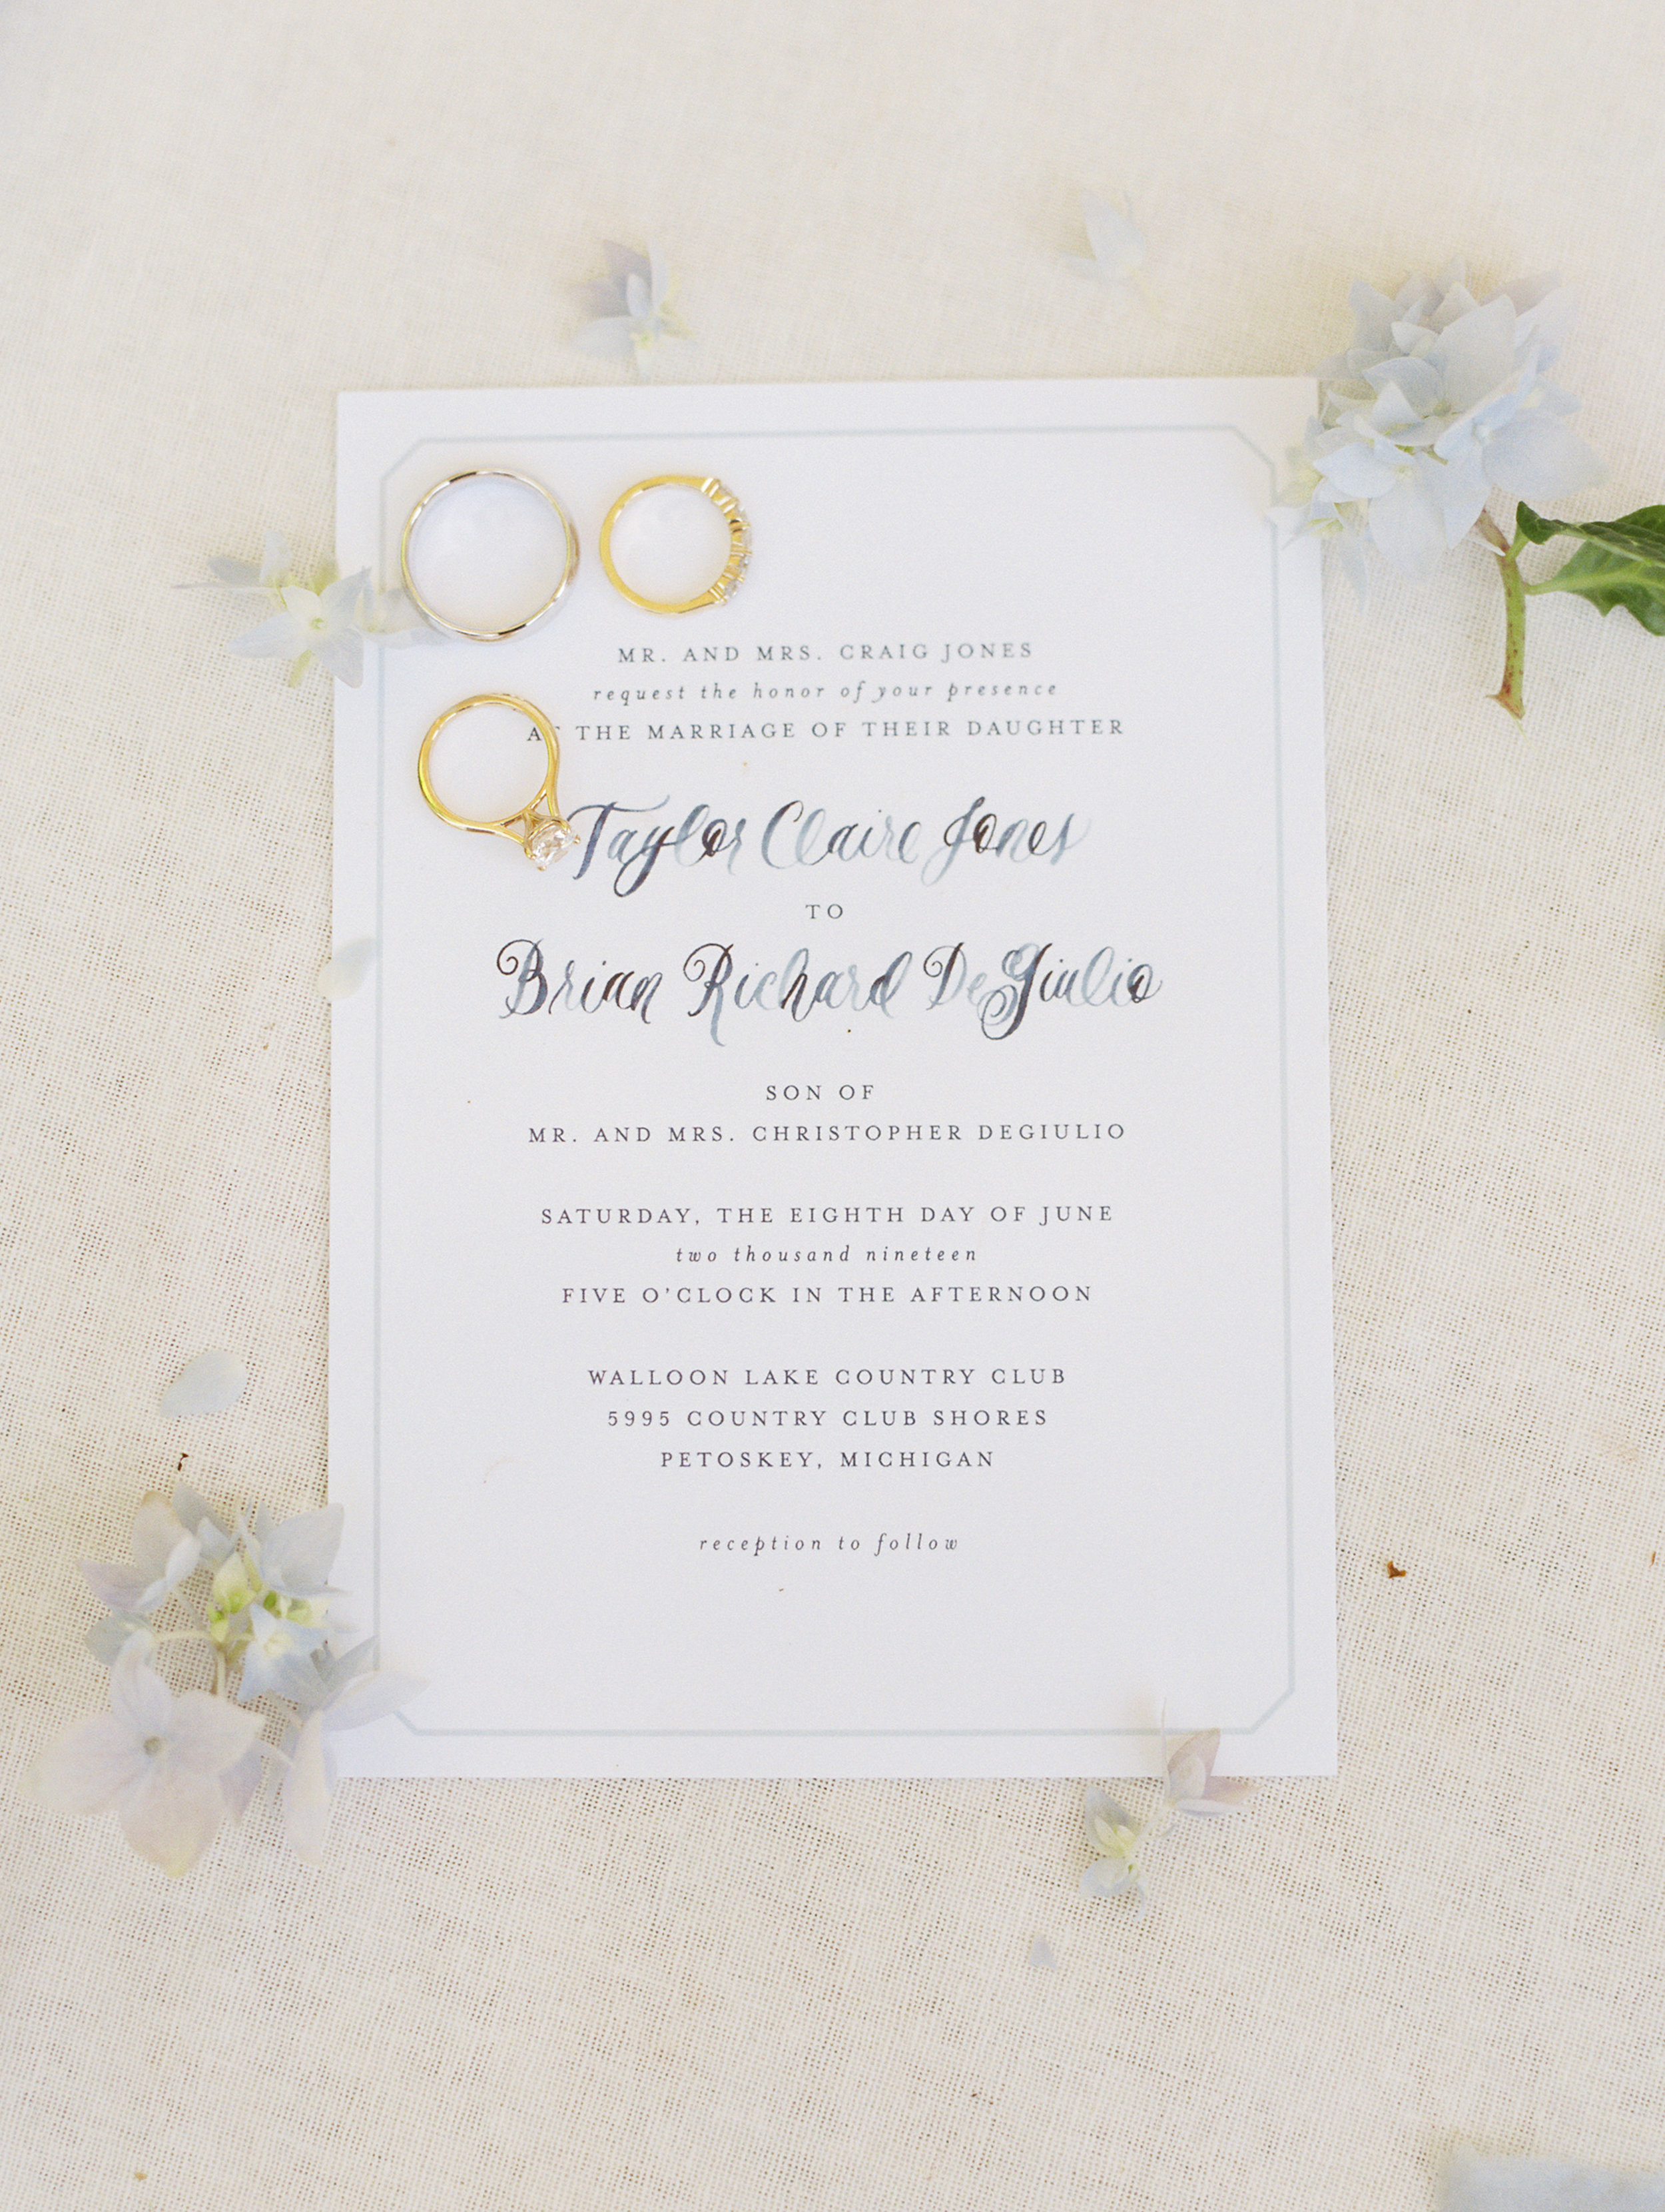 DeGuilio+Wedding+Detailsf-4 copy.jpg